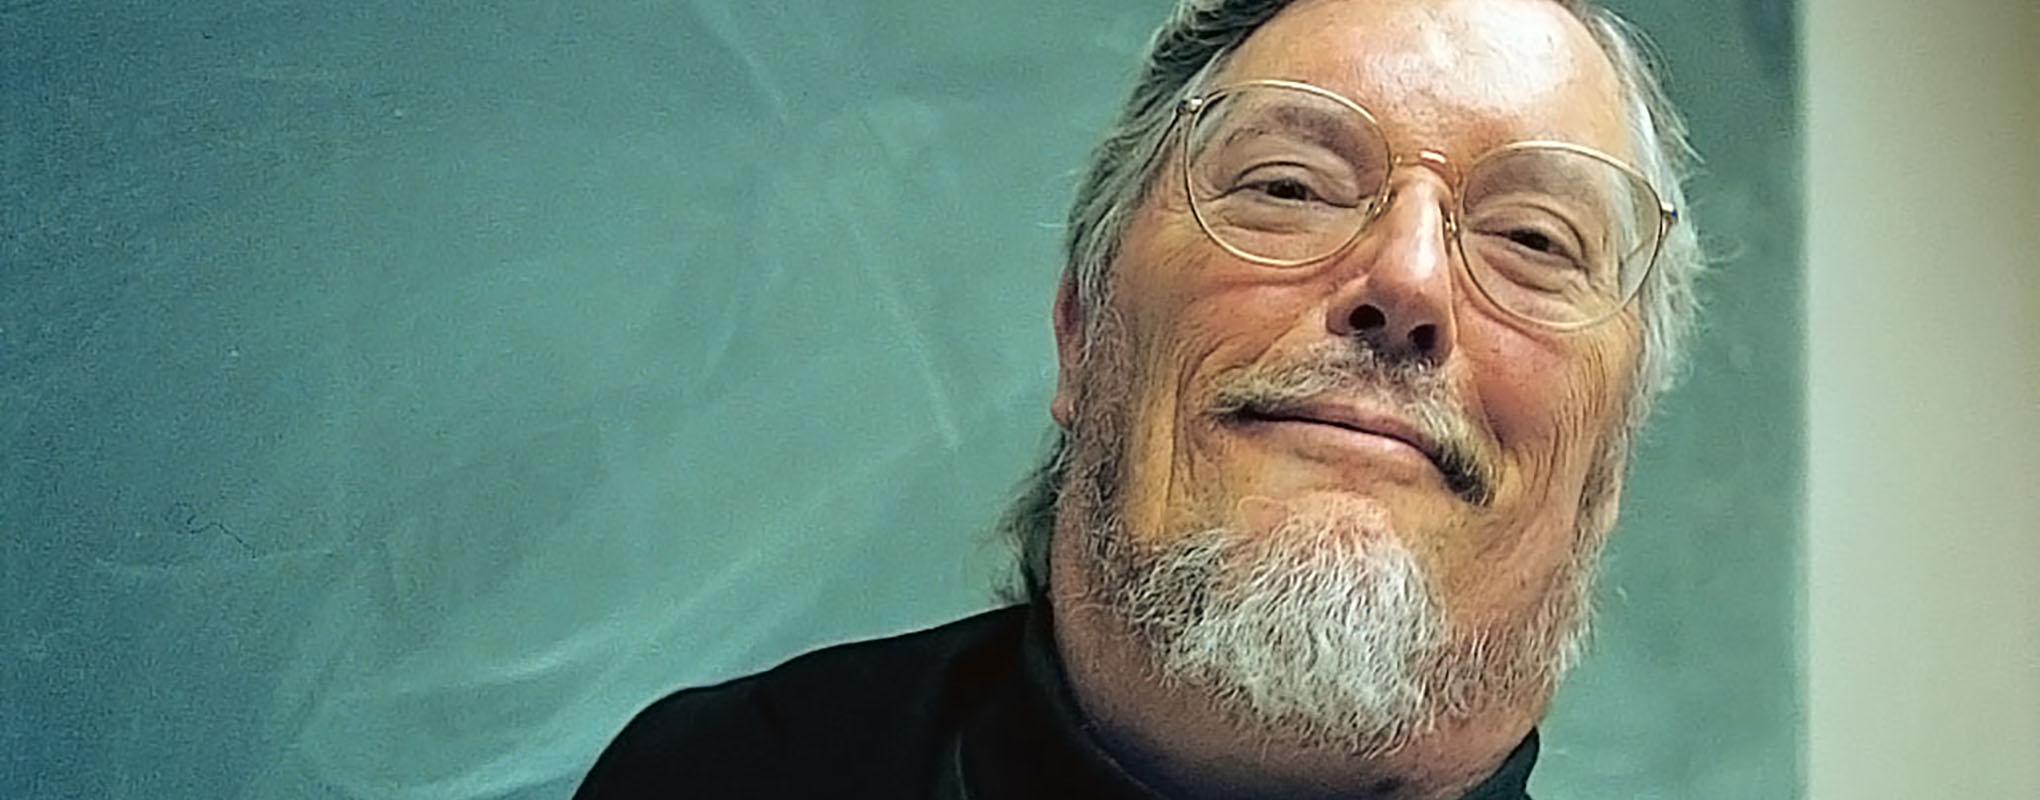 Portrait of Paul Longmore